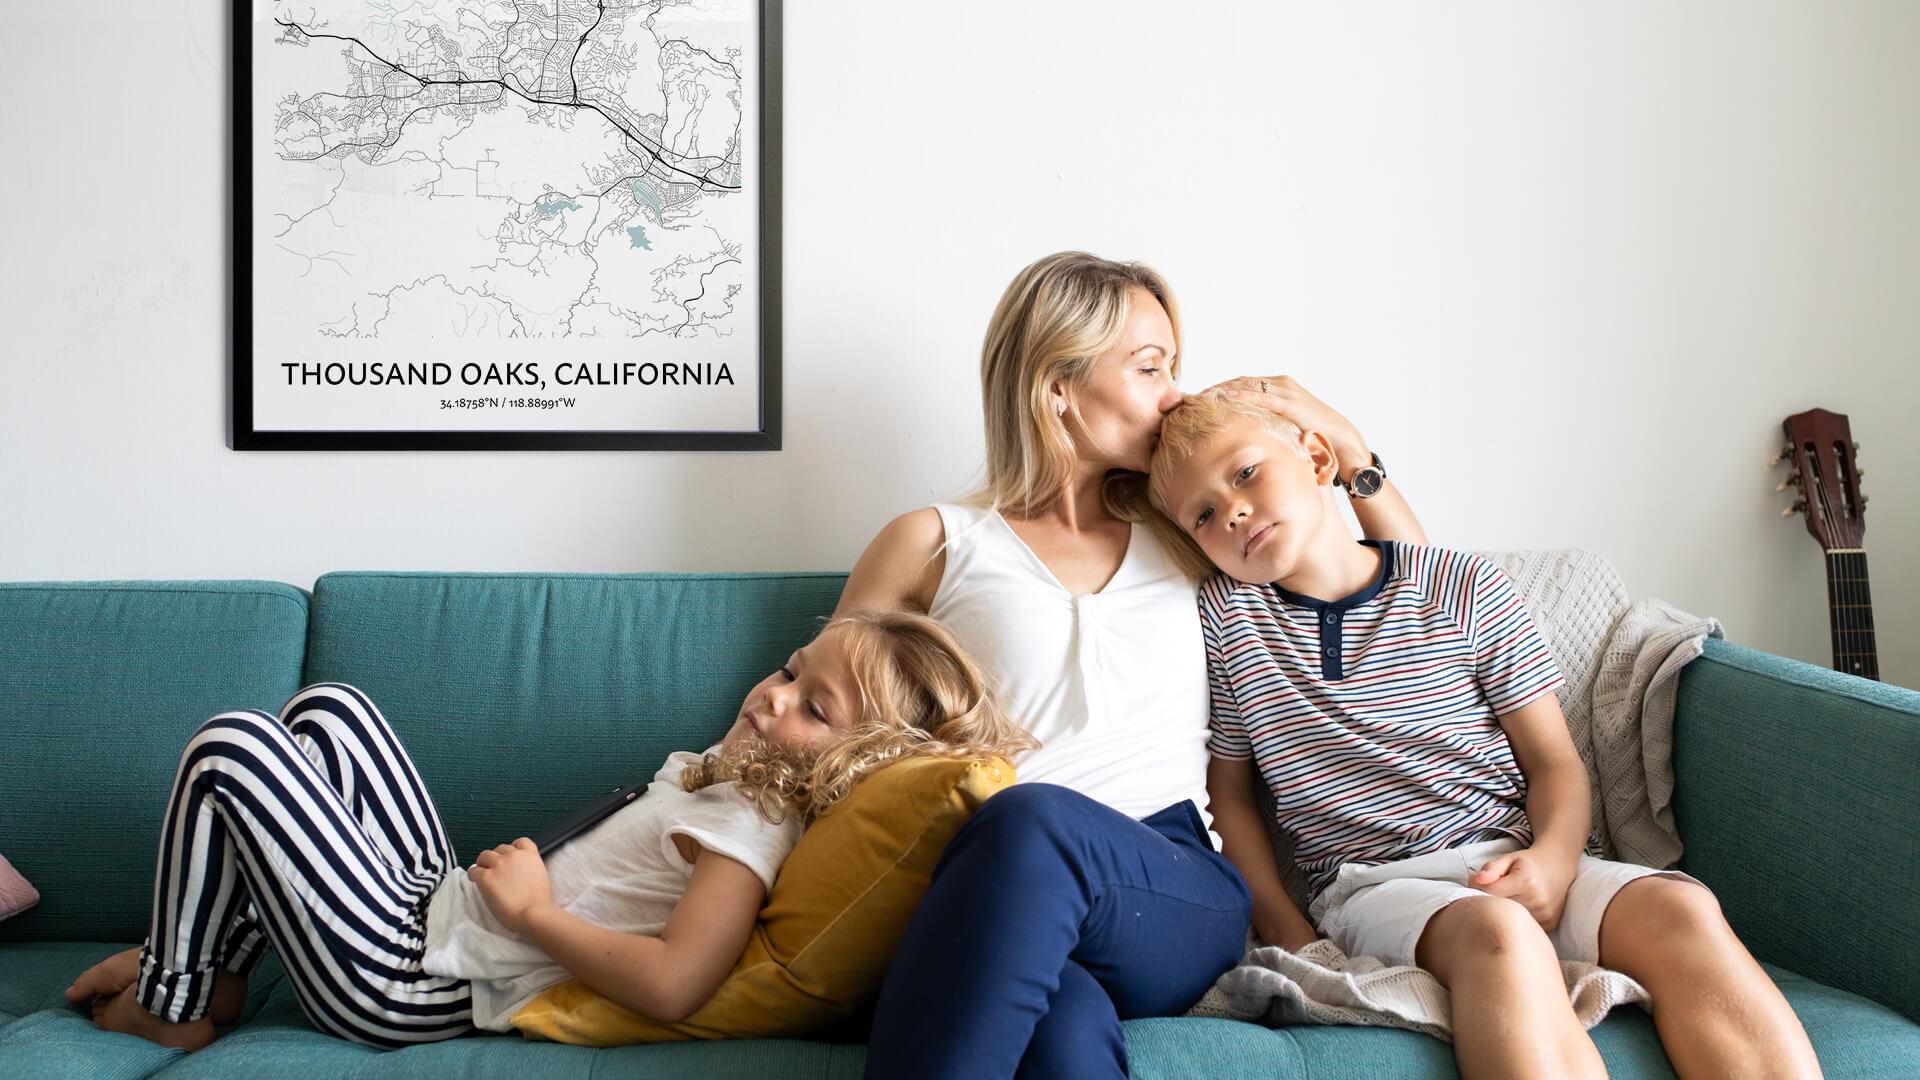 Thousand Oaks map poster